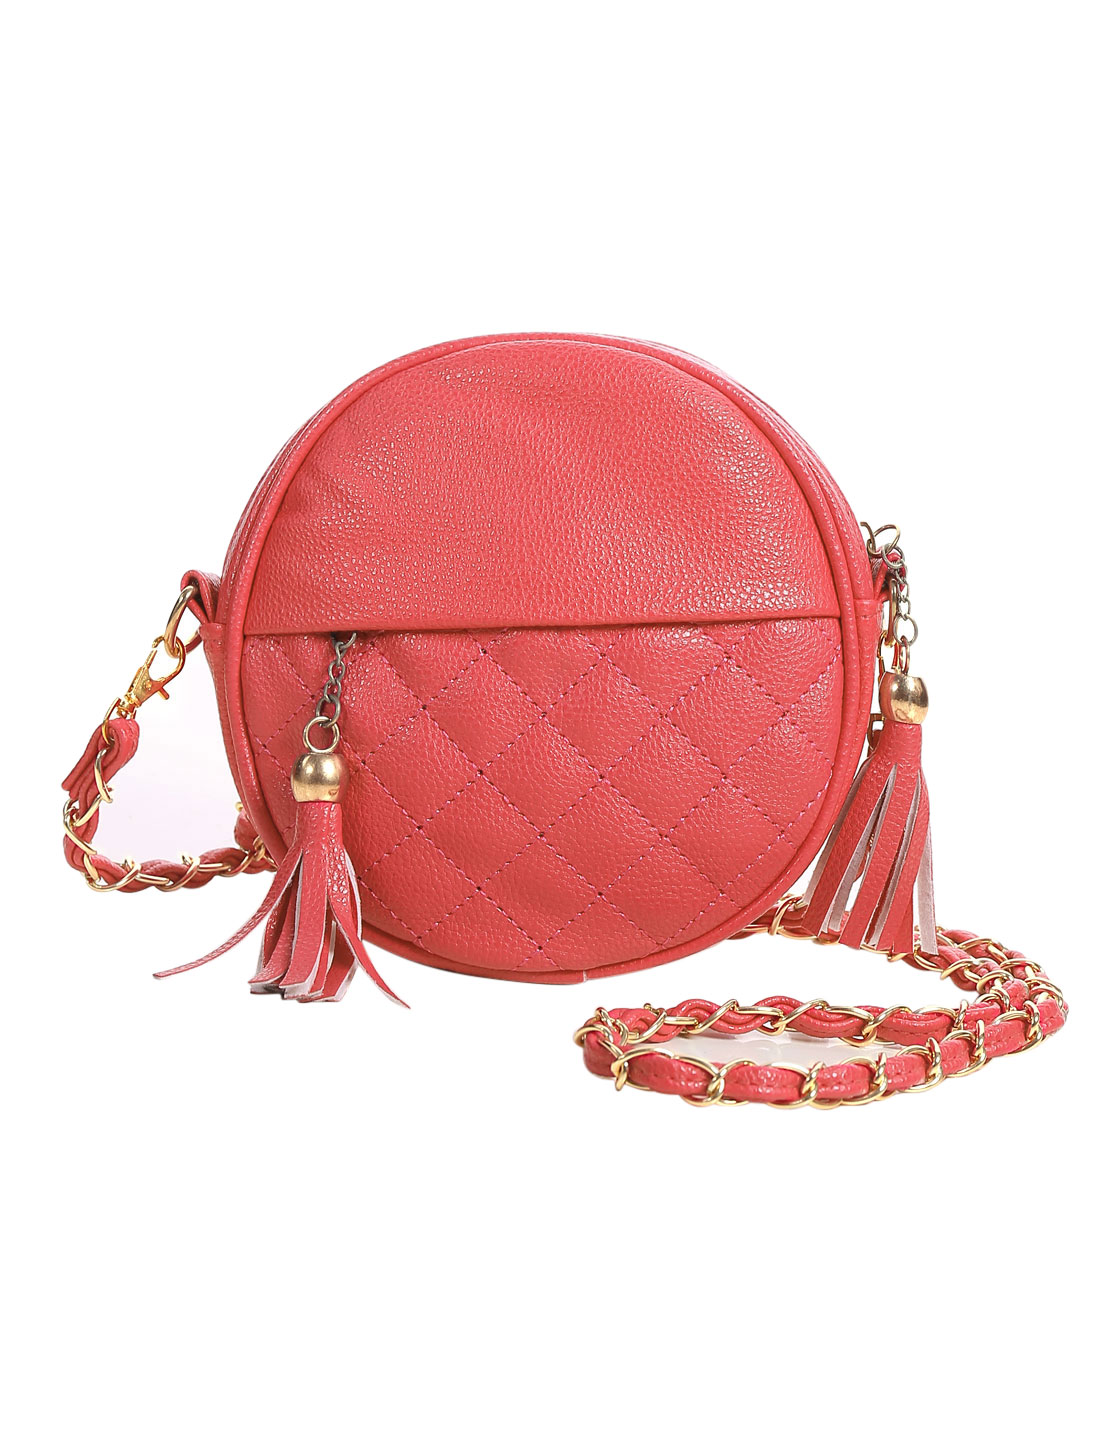 Ladies Zipper Closure Tassels Decor Check Design Chain Strap Casual Bags Salmon